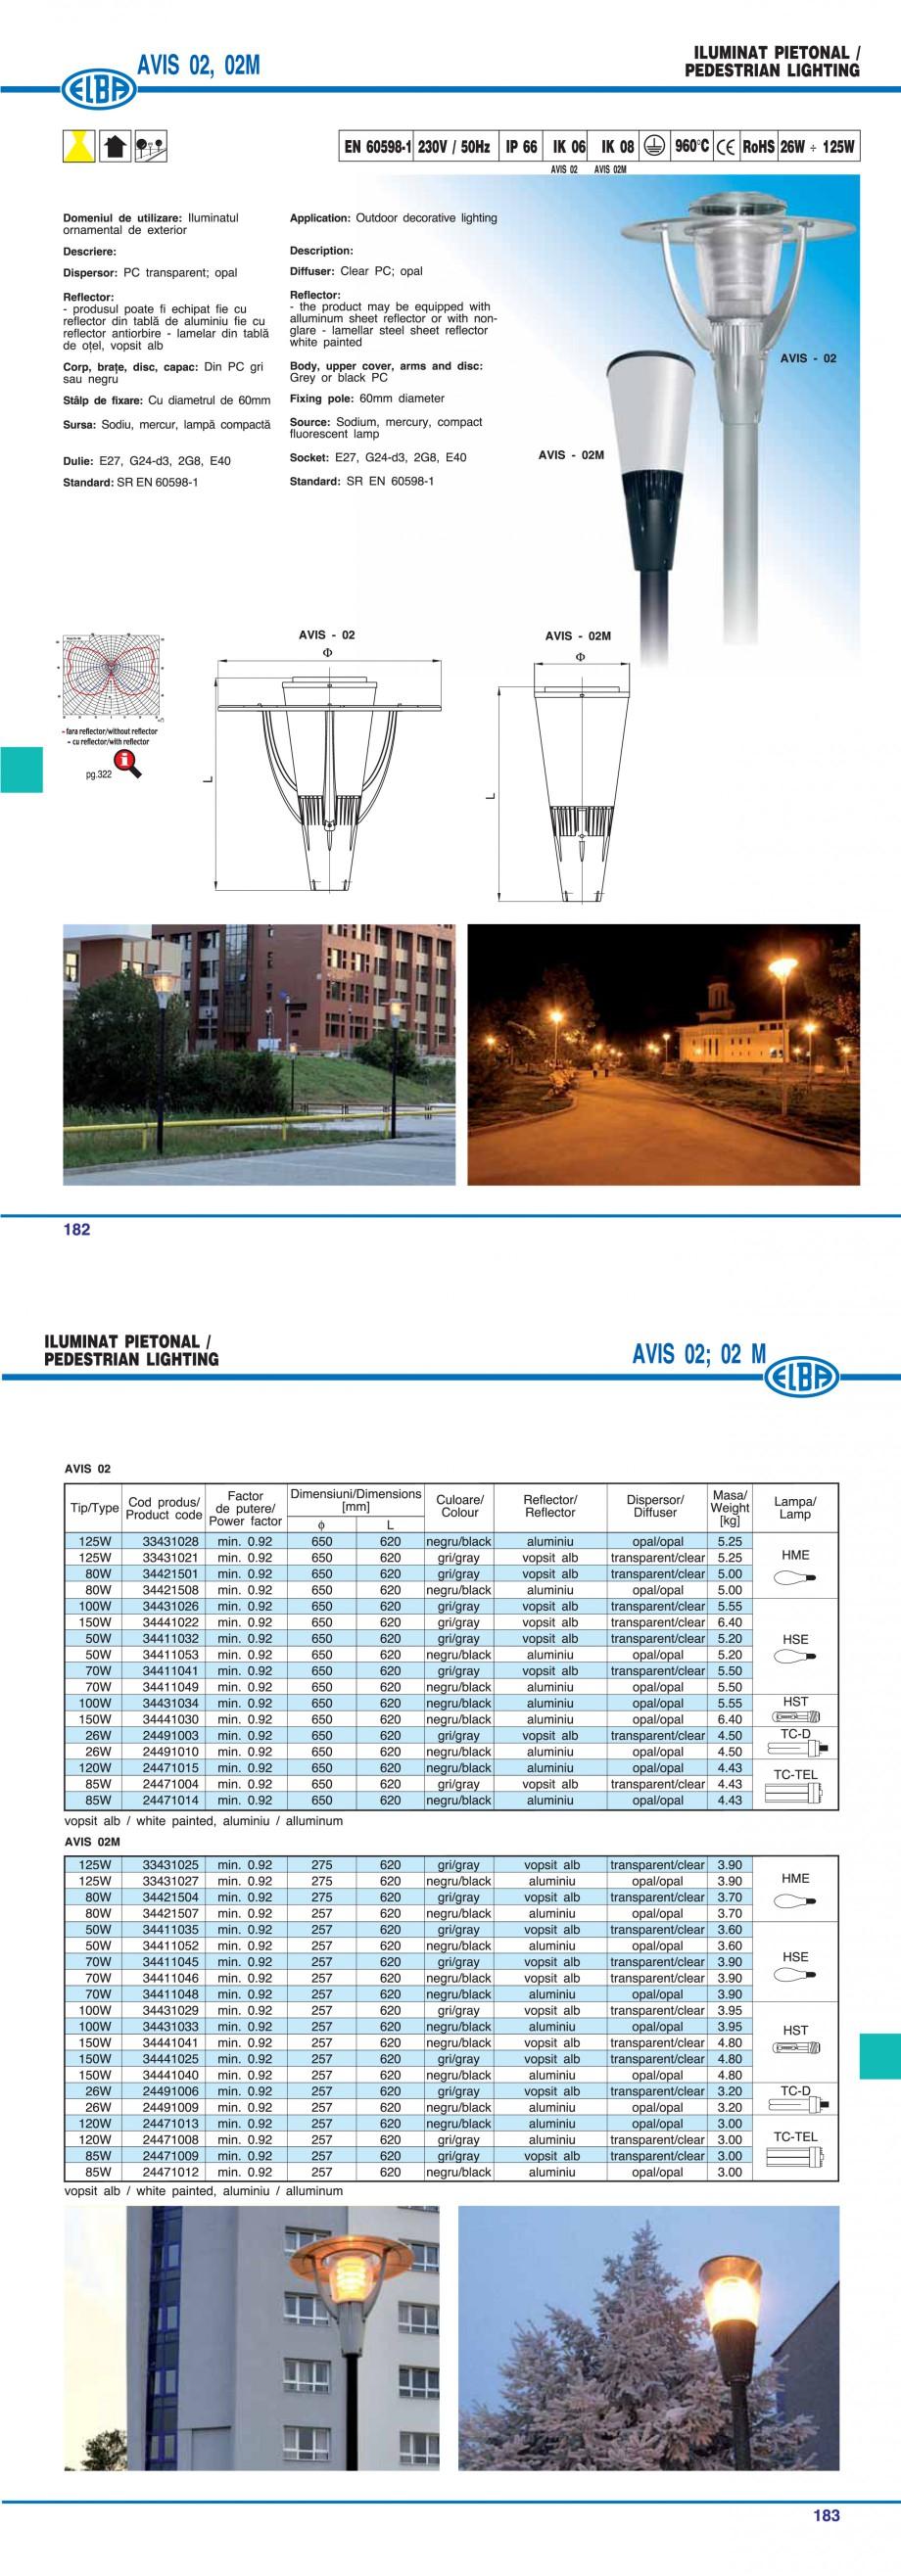 Pagina 1 - Corp pentru iluminat pietonal ELBA AVIS 02M Fisa tehnica Romana, Engleza